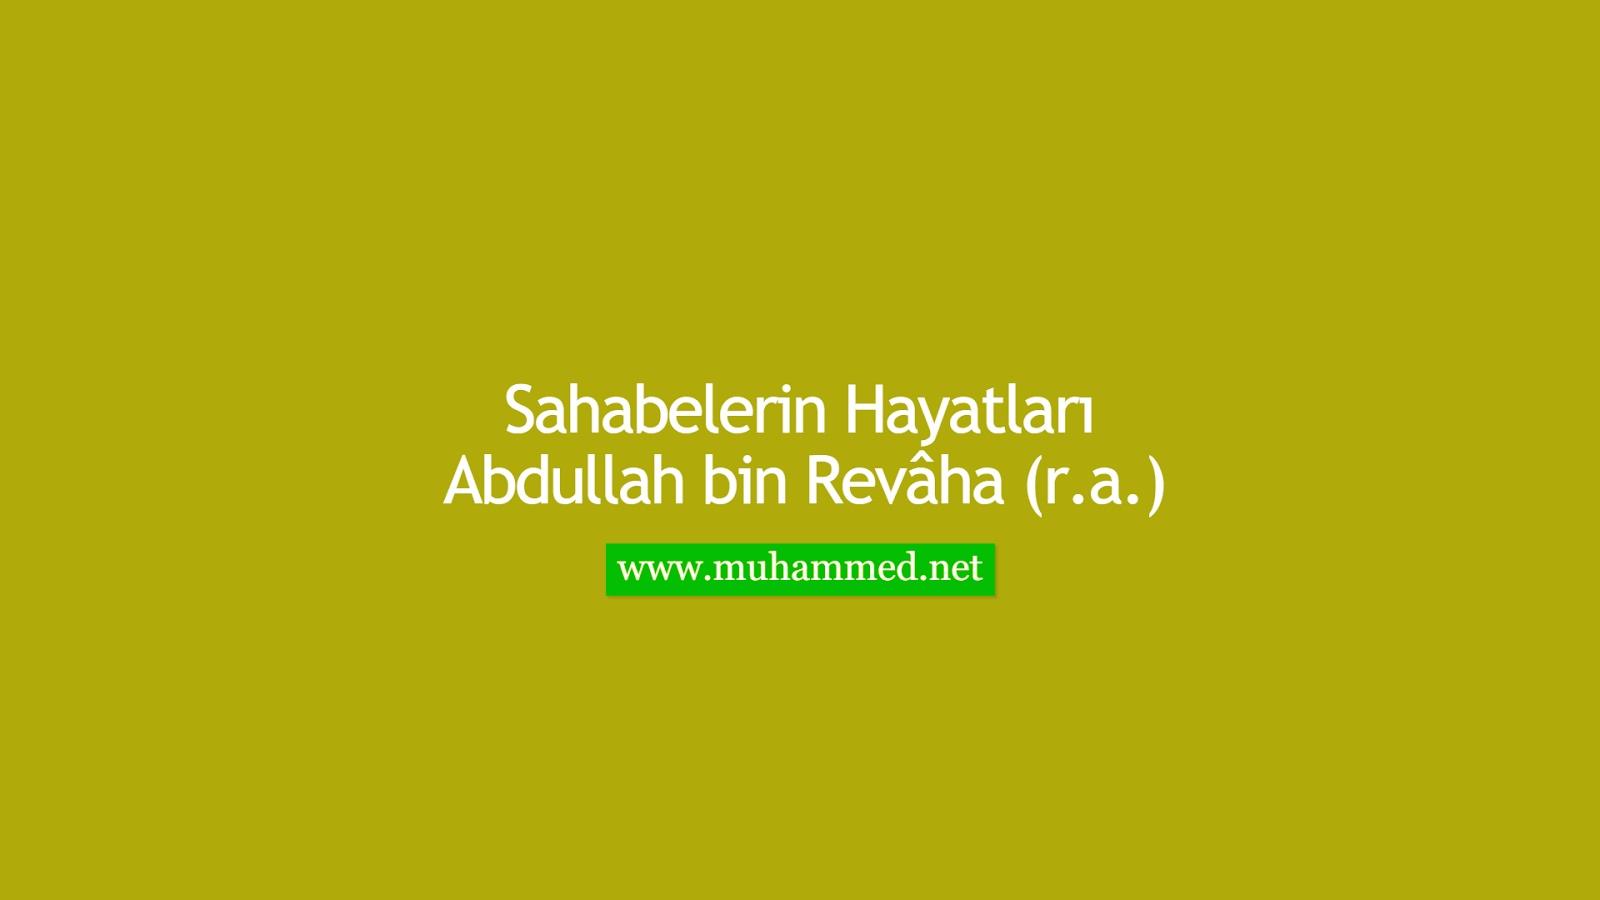 Abdullah bin Revâha (r.a.)